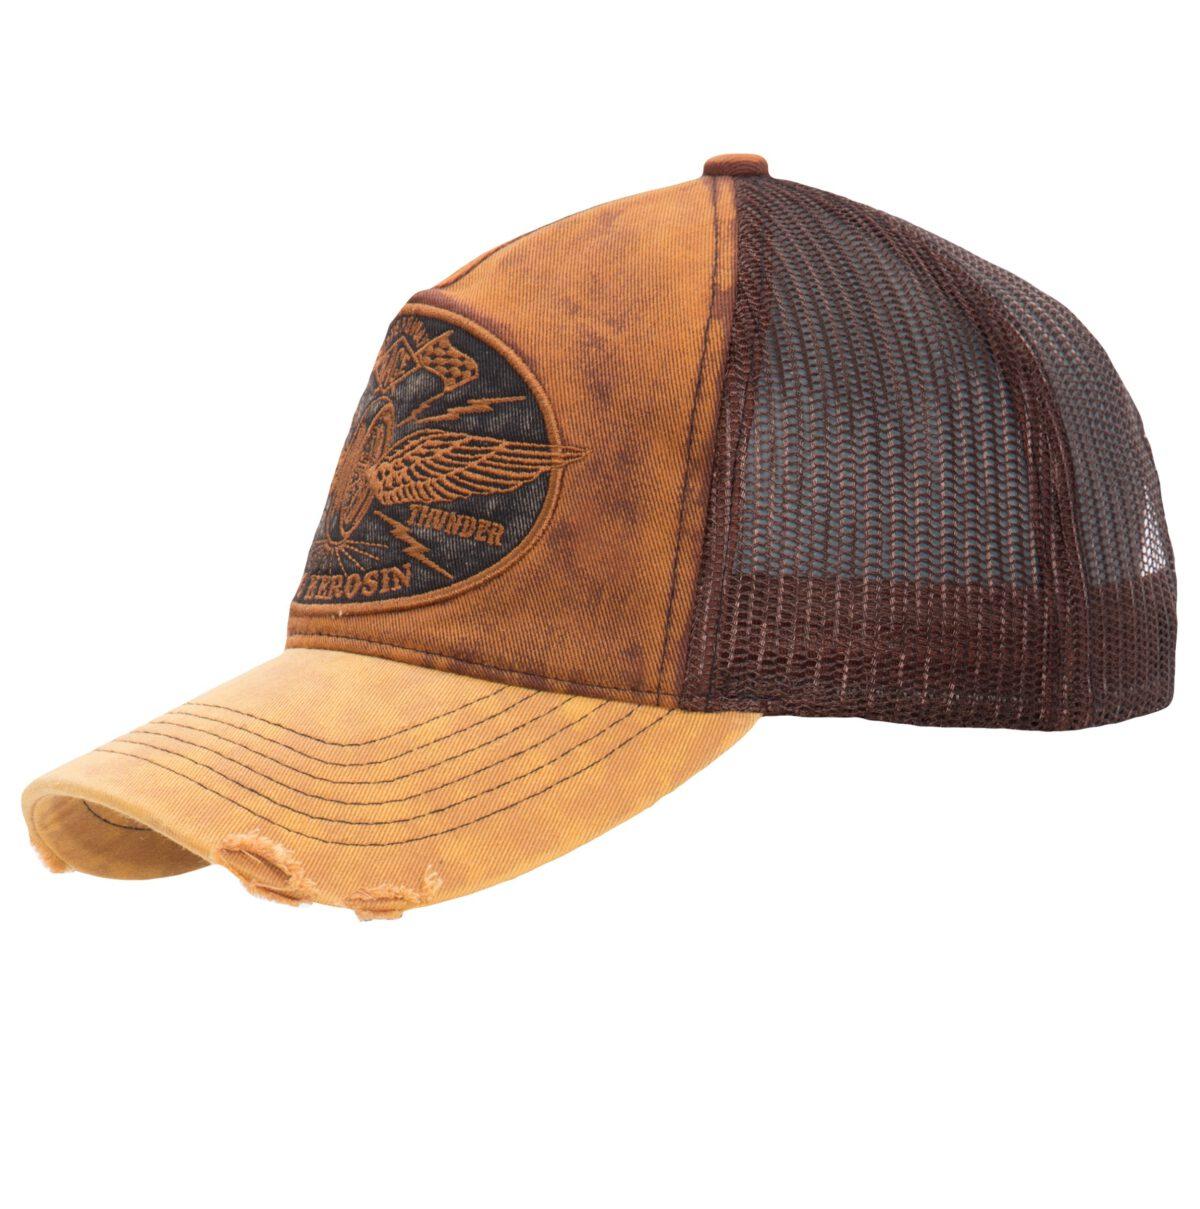 TRUCKER DENIM CAP »RIDE LIKE THUNDER« IM VINTAGE JEANS LOOK MIT STICKEREI »RIDE LIKE THUNDER«